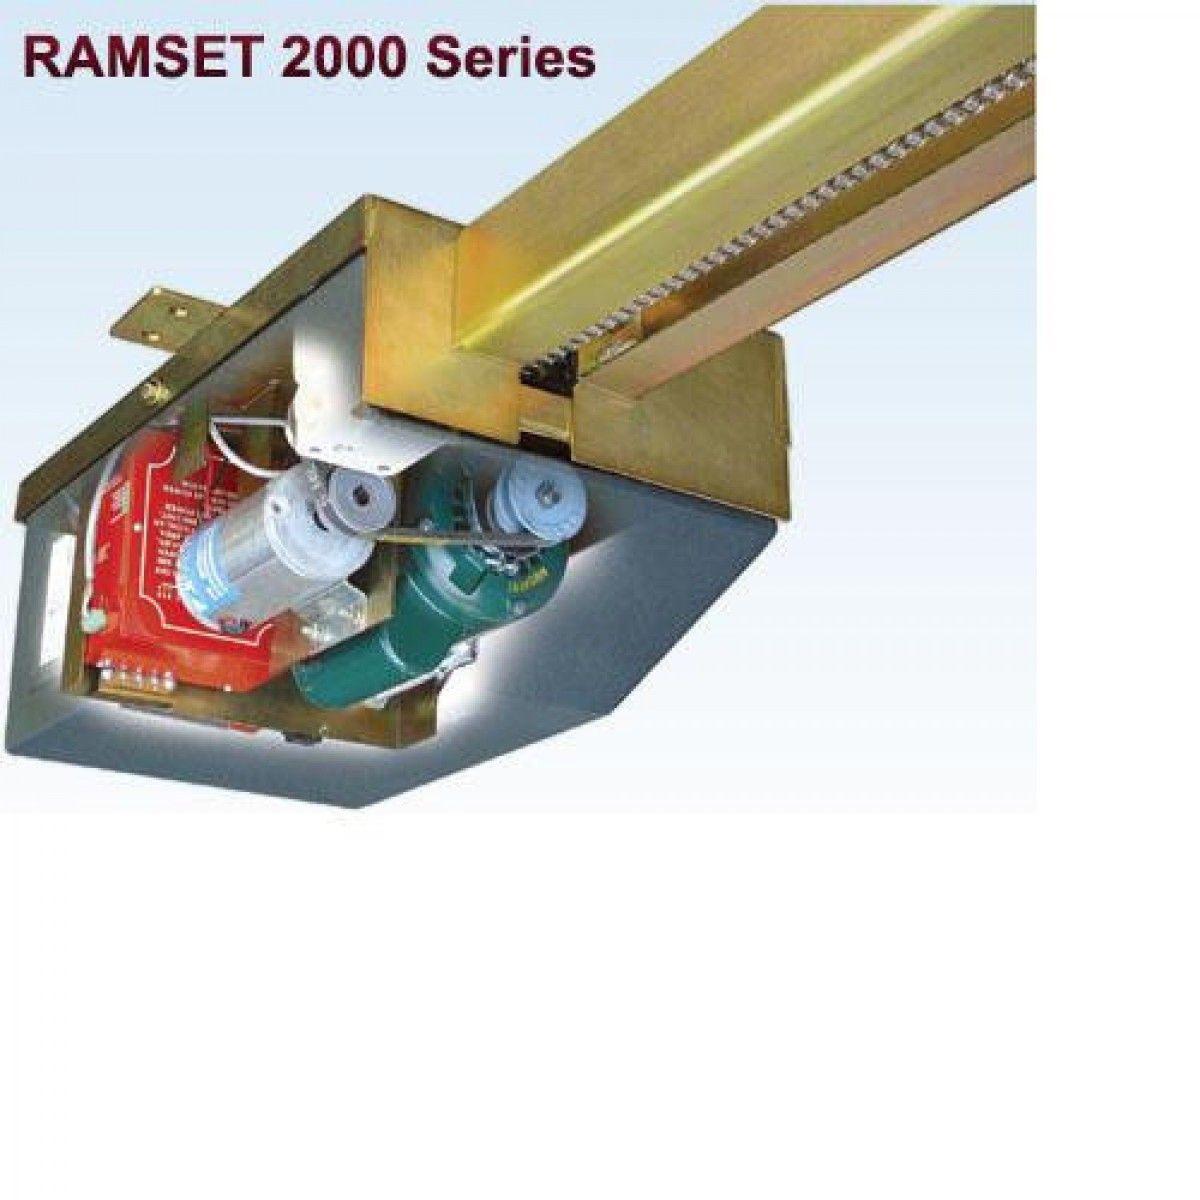 Ramset RAM 2200 Overhead Gate Operator